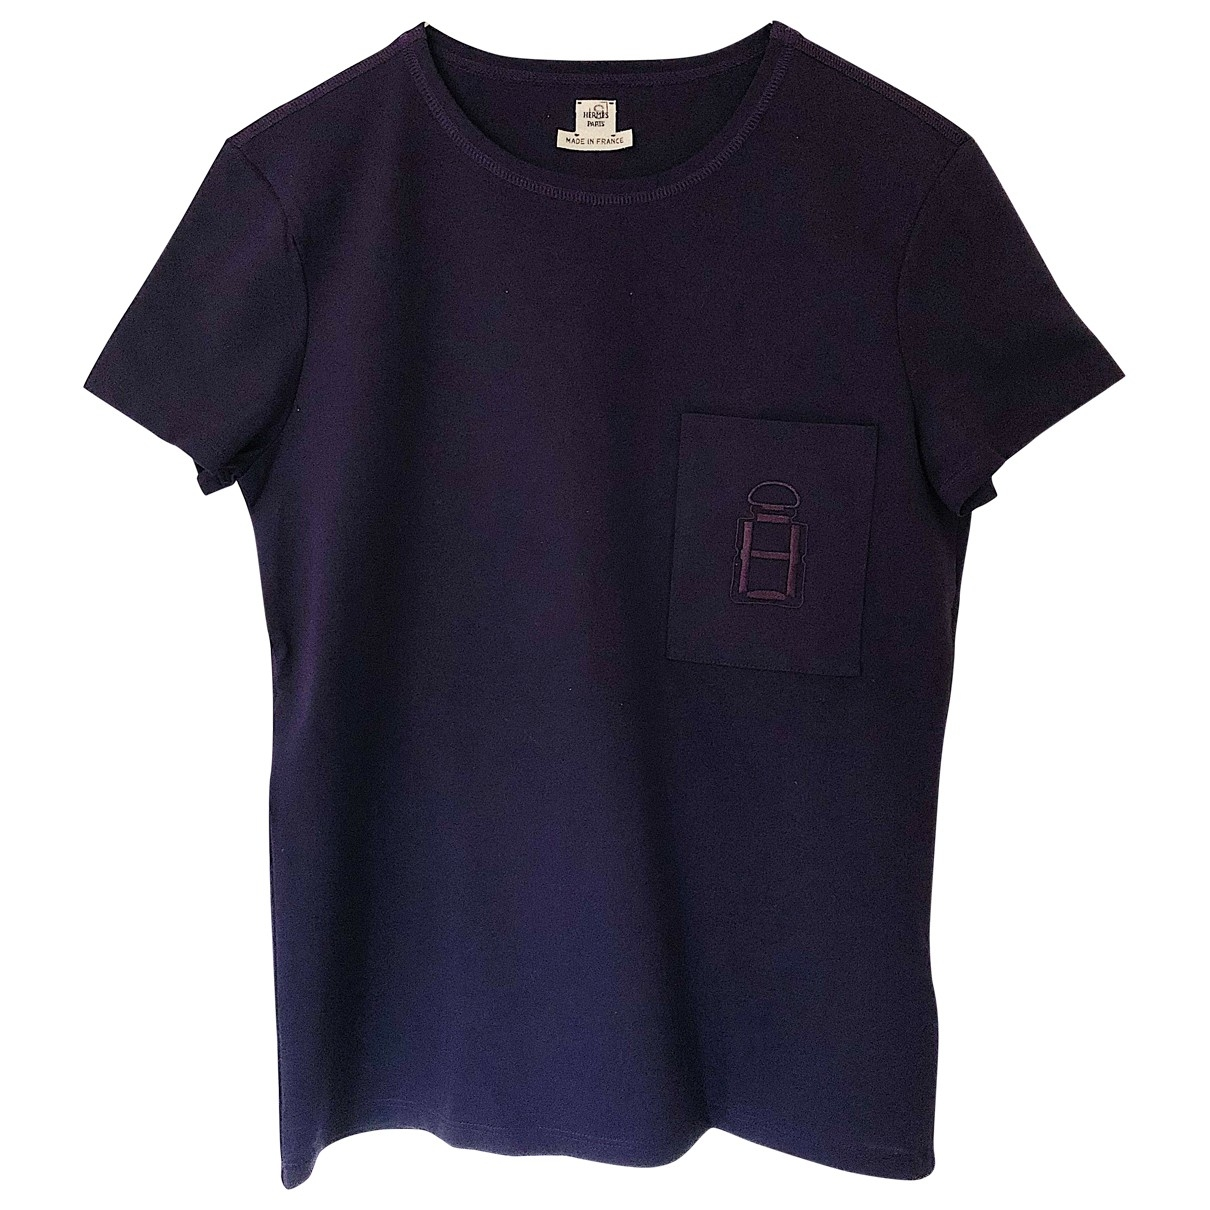 Hermes \N Top in  Lila Polyester